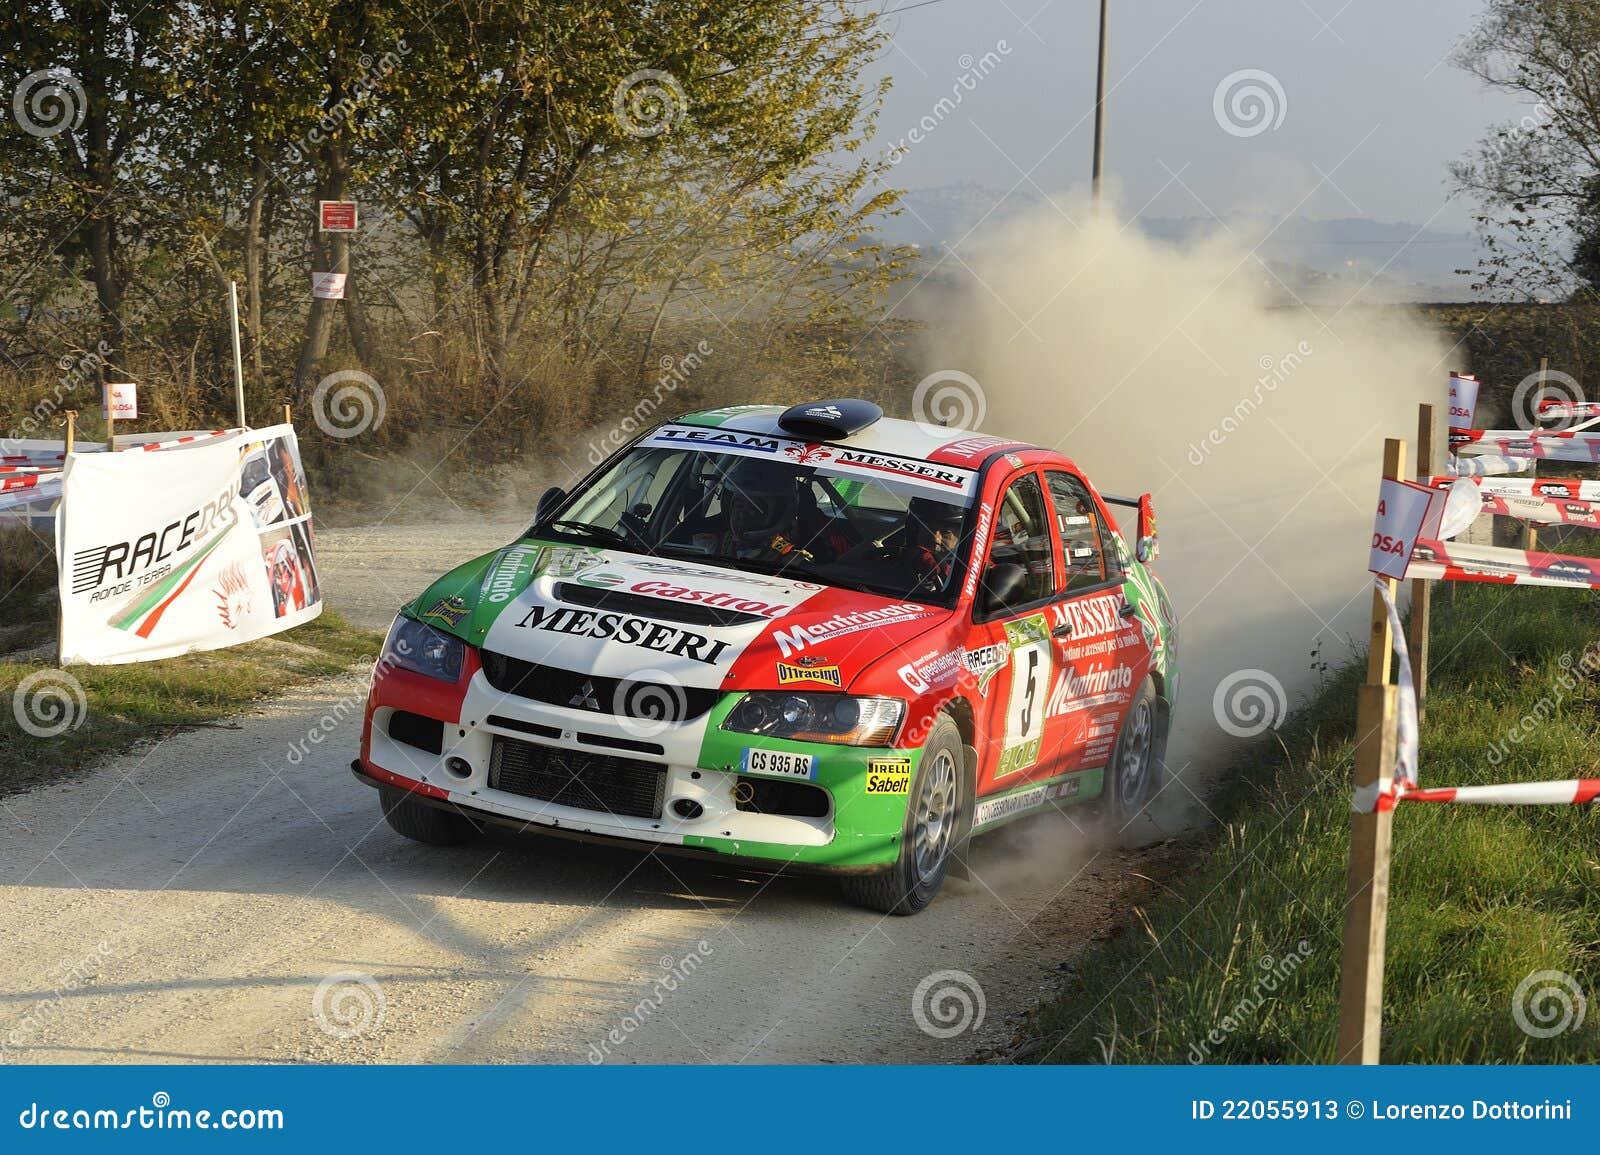 Mitsubishi Lancer Evo Ix Rally Car Editorial Stock Photo Image Of